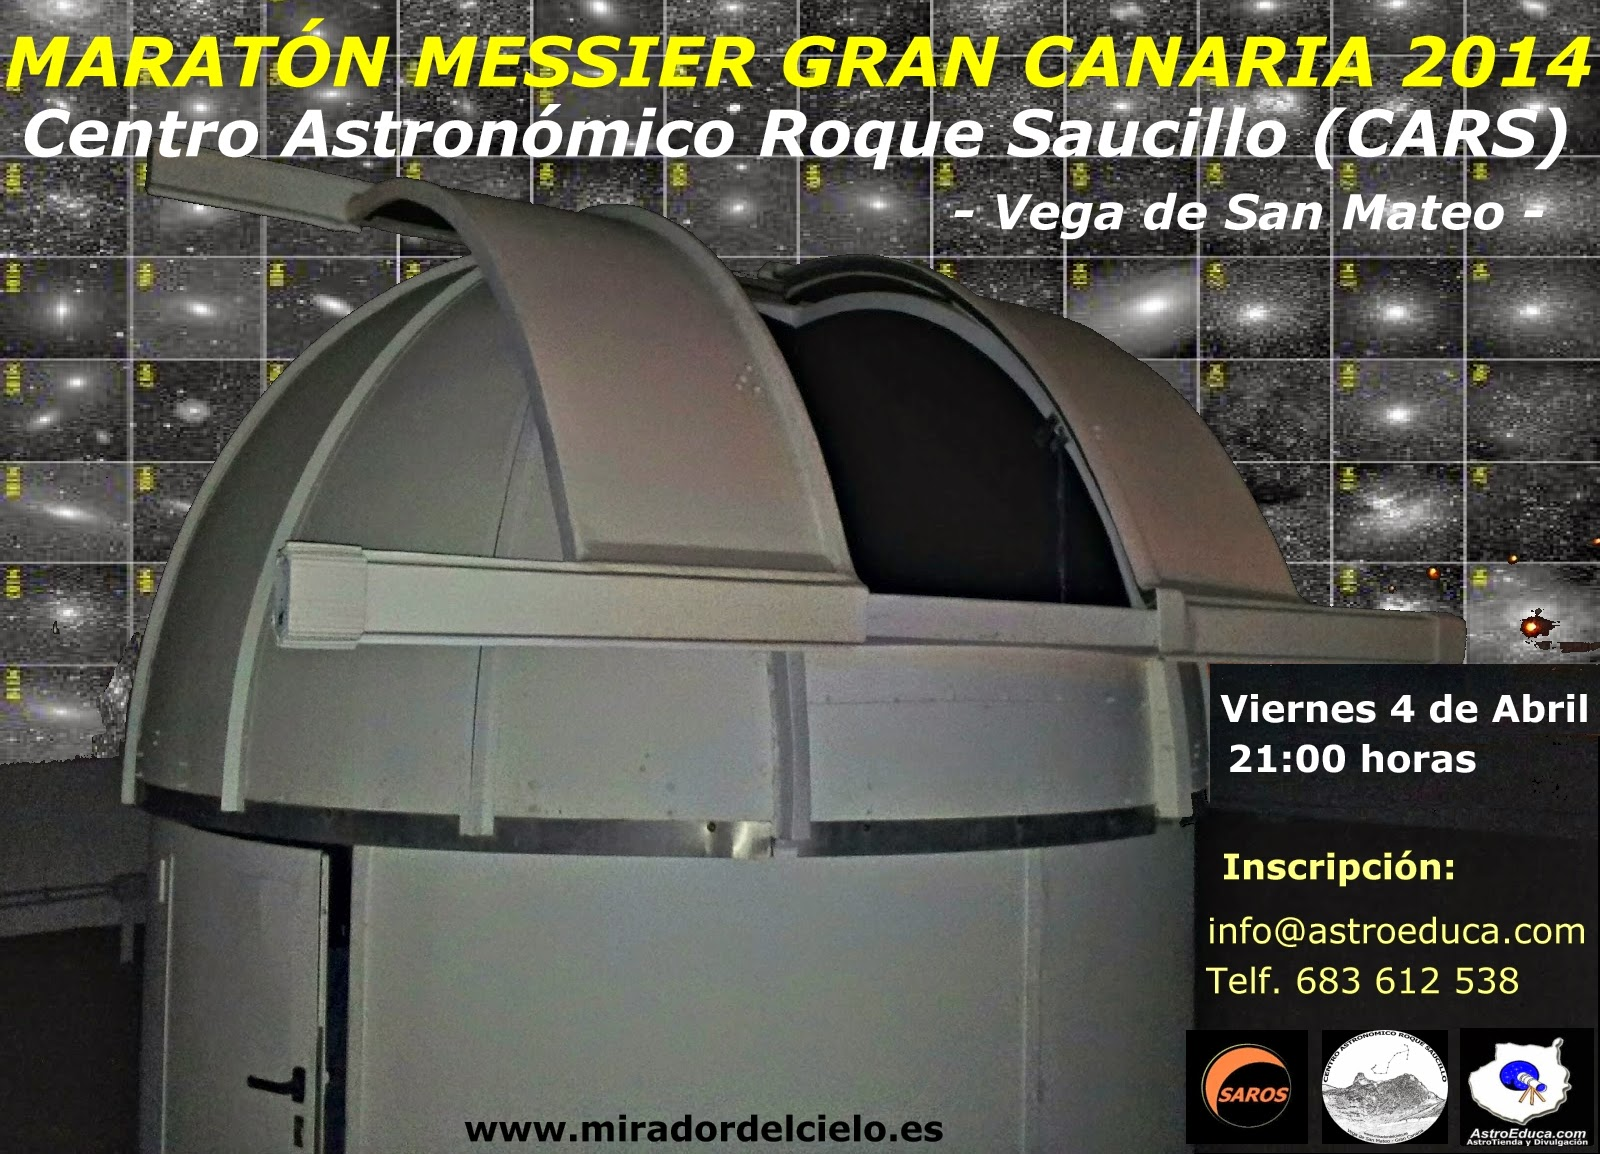 Maratón Messier Gran Canaria 2014